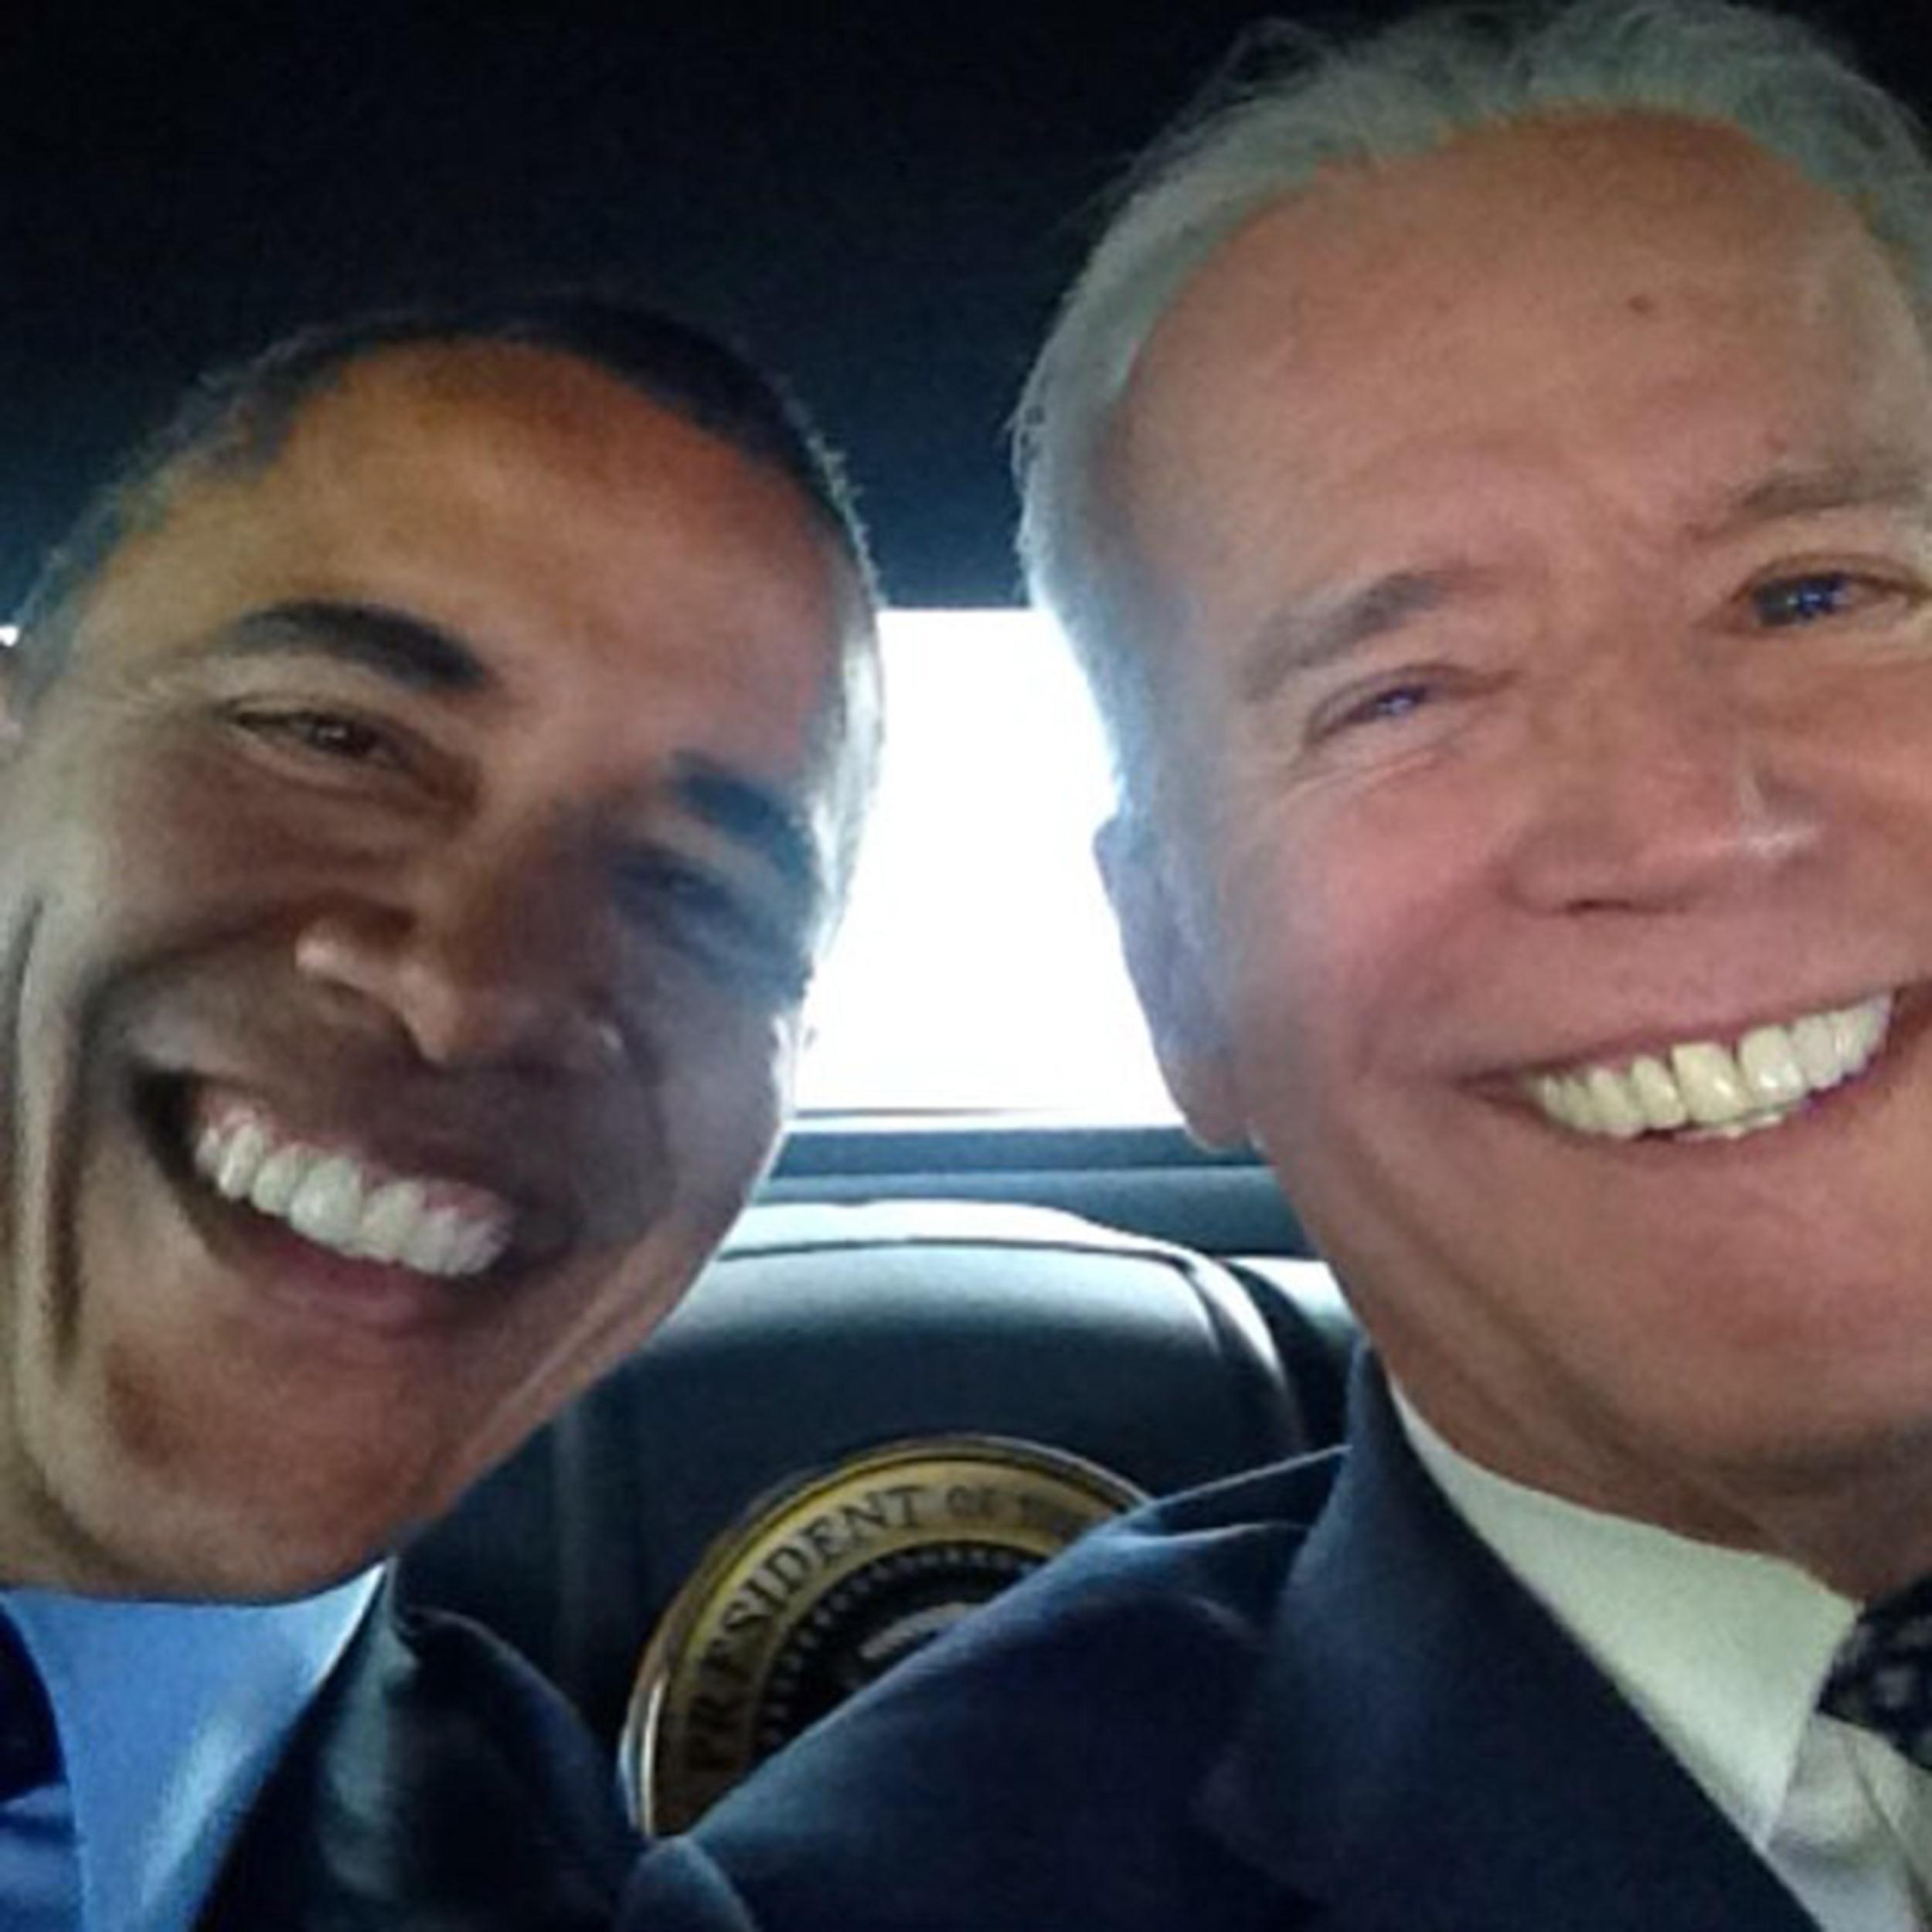 140416-biden-obama-instagram-jms-2141_dac6435e3354f272606083beda6c7a62.jpg